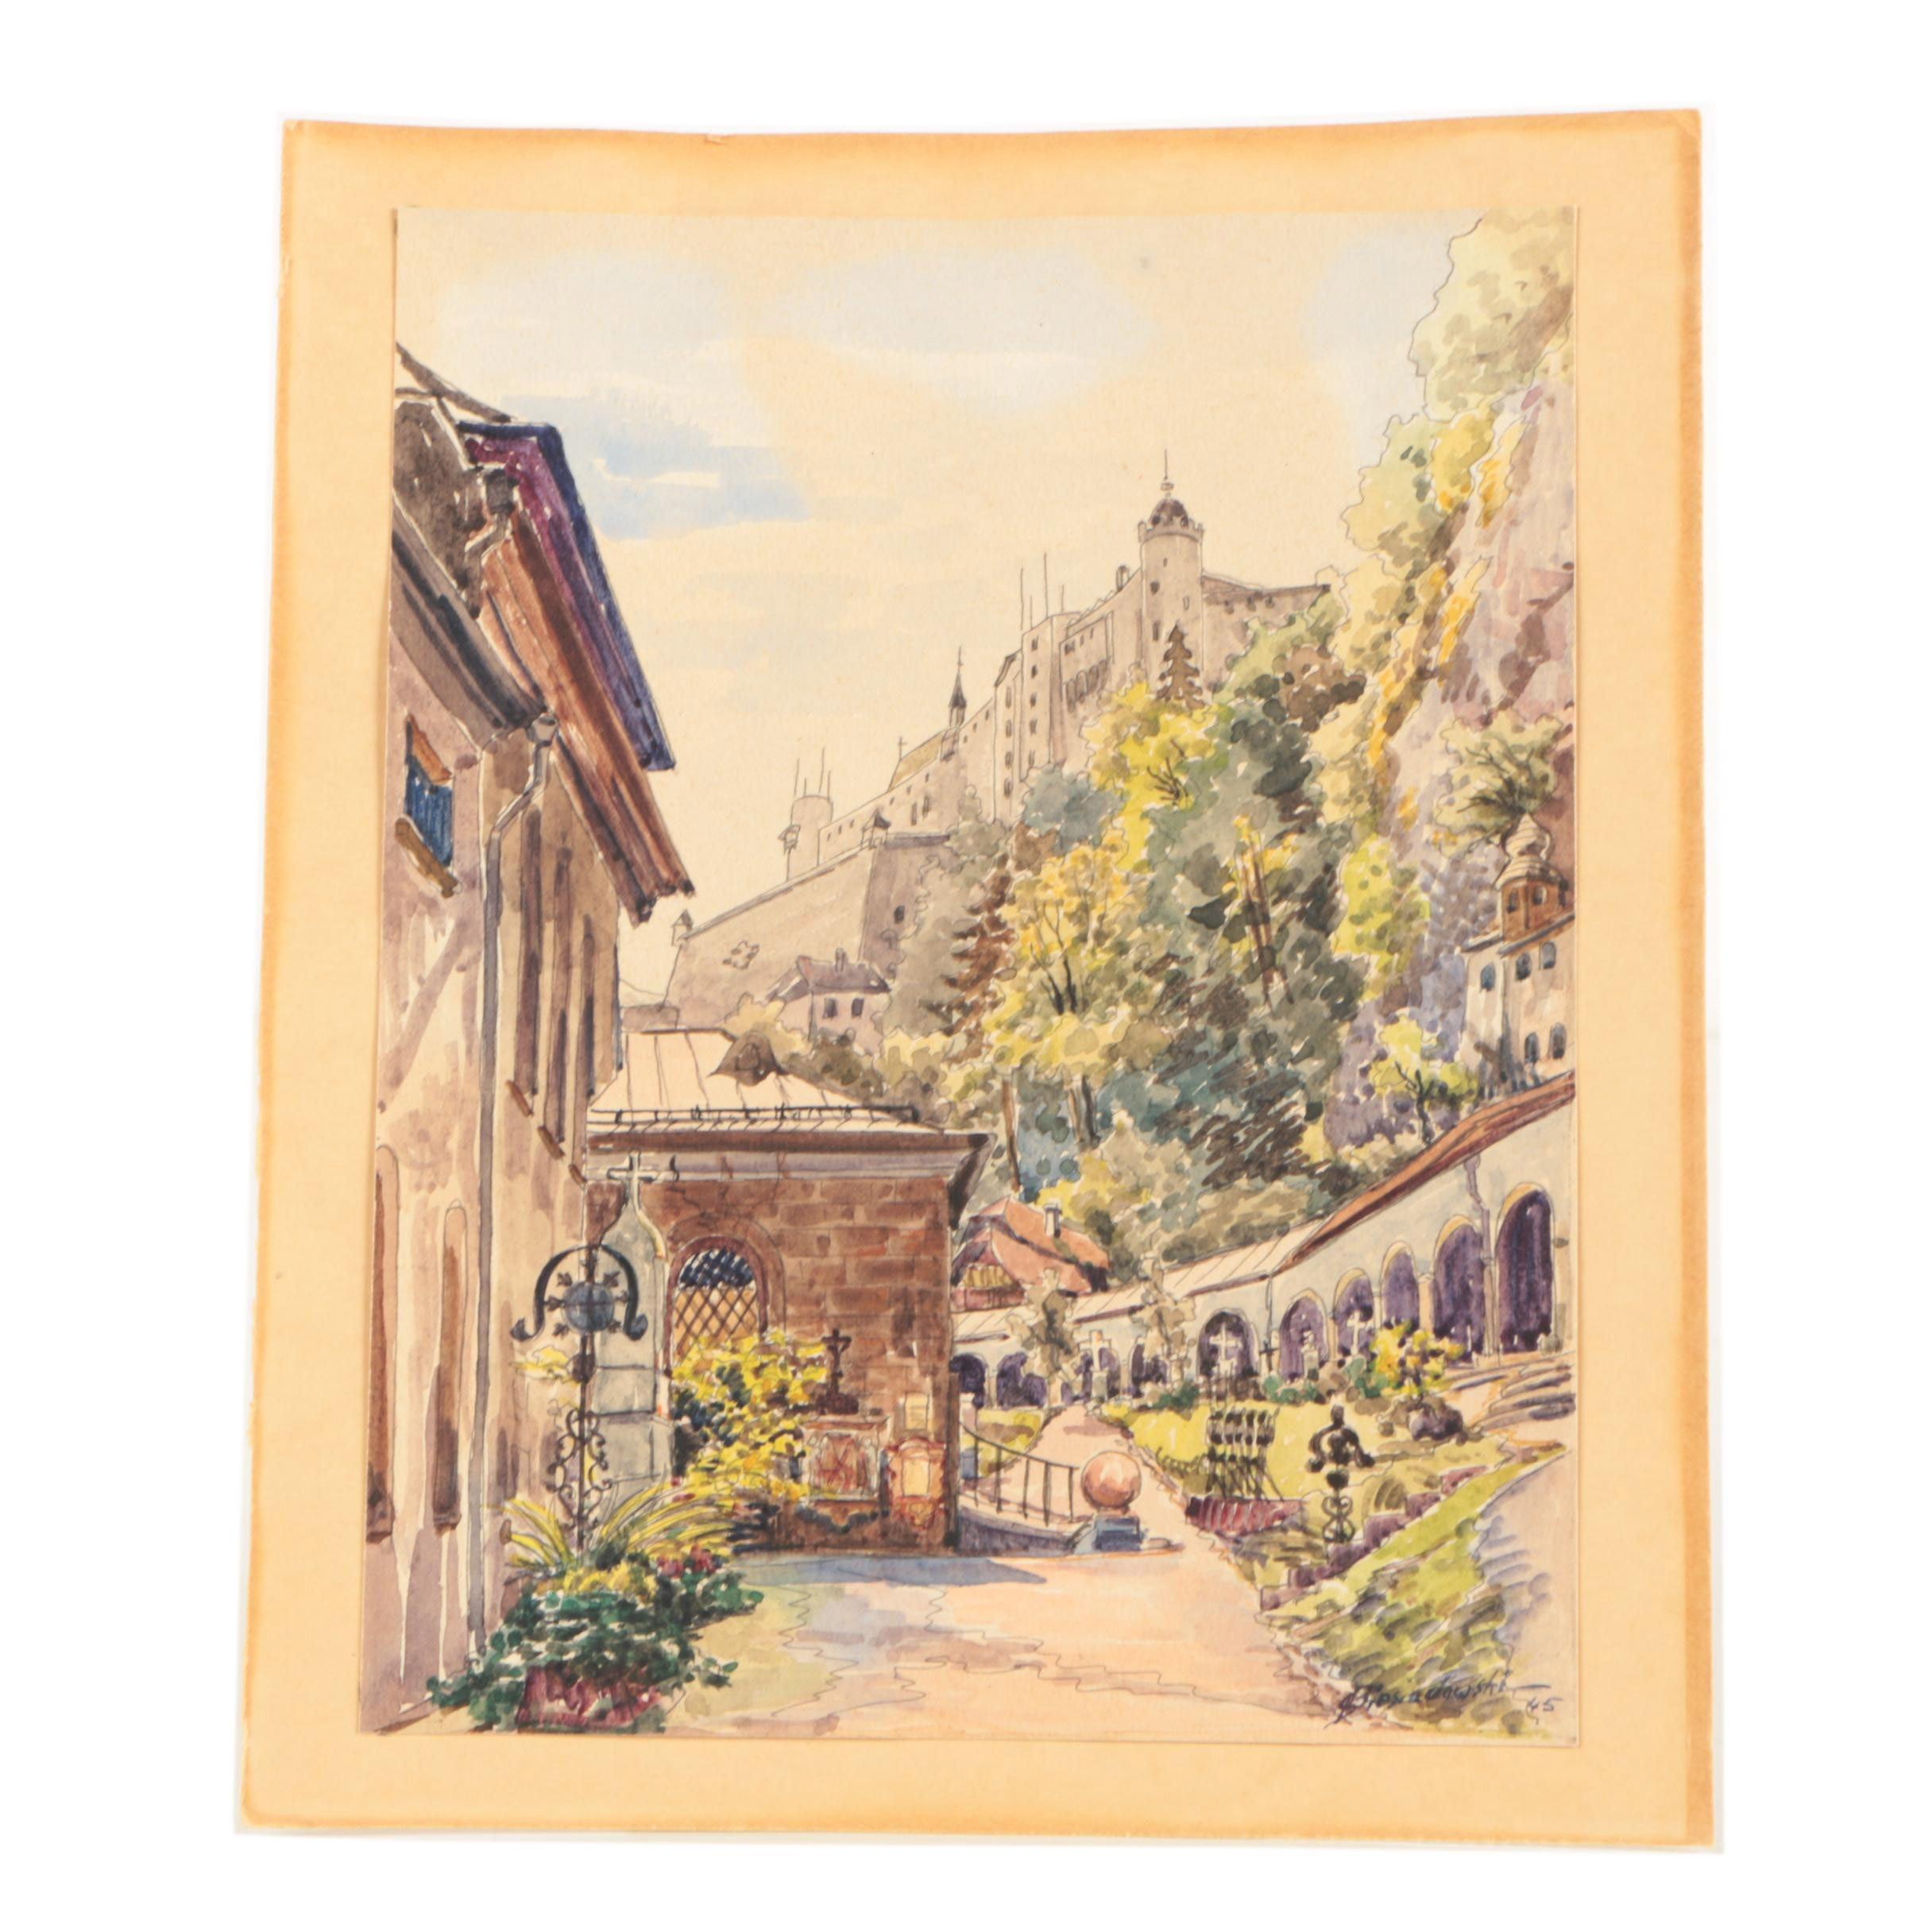 Biesiadowski Watercolor and Gouache Painting